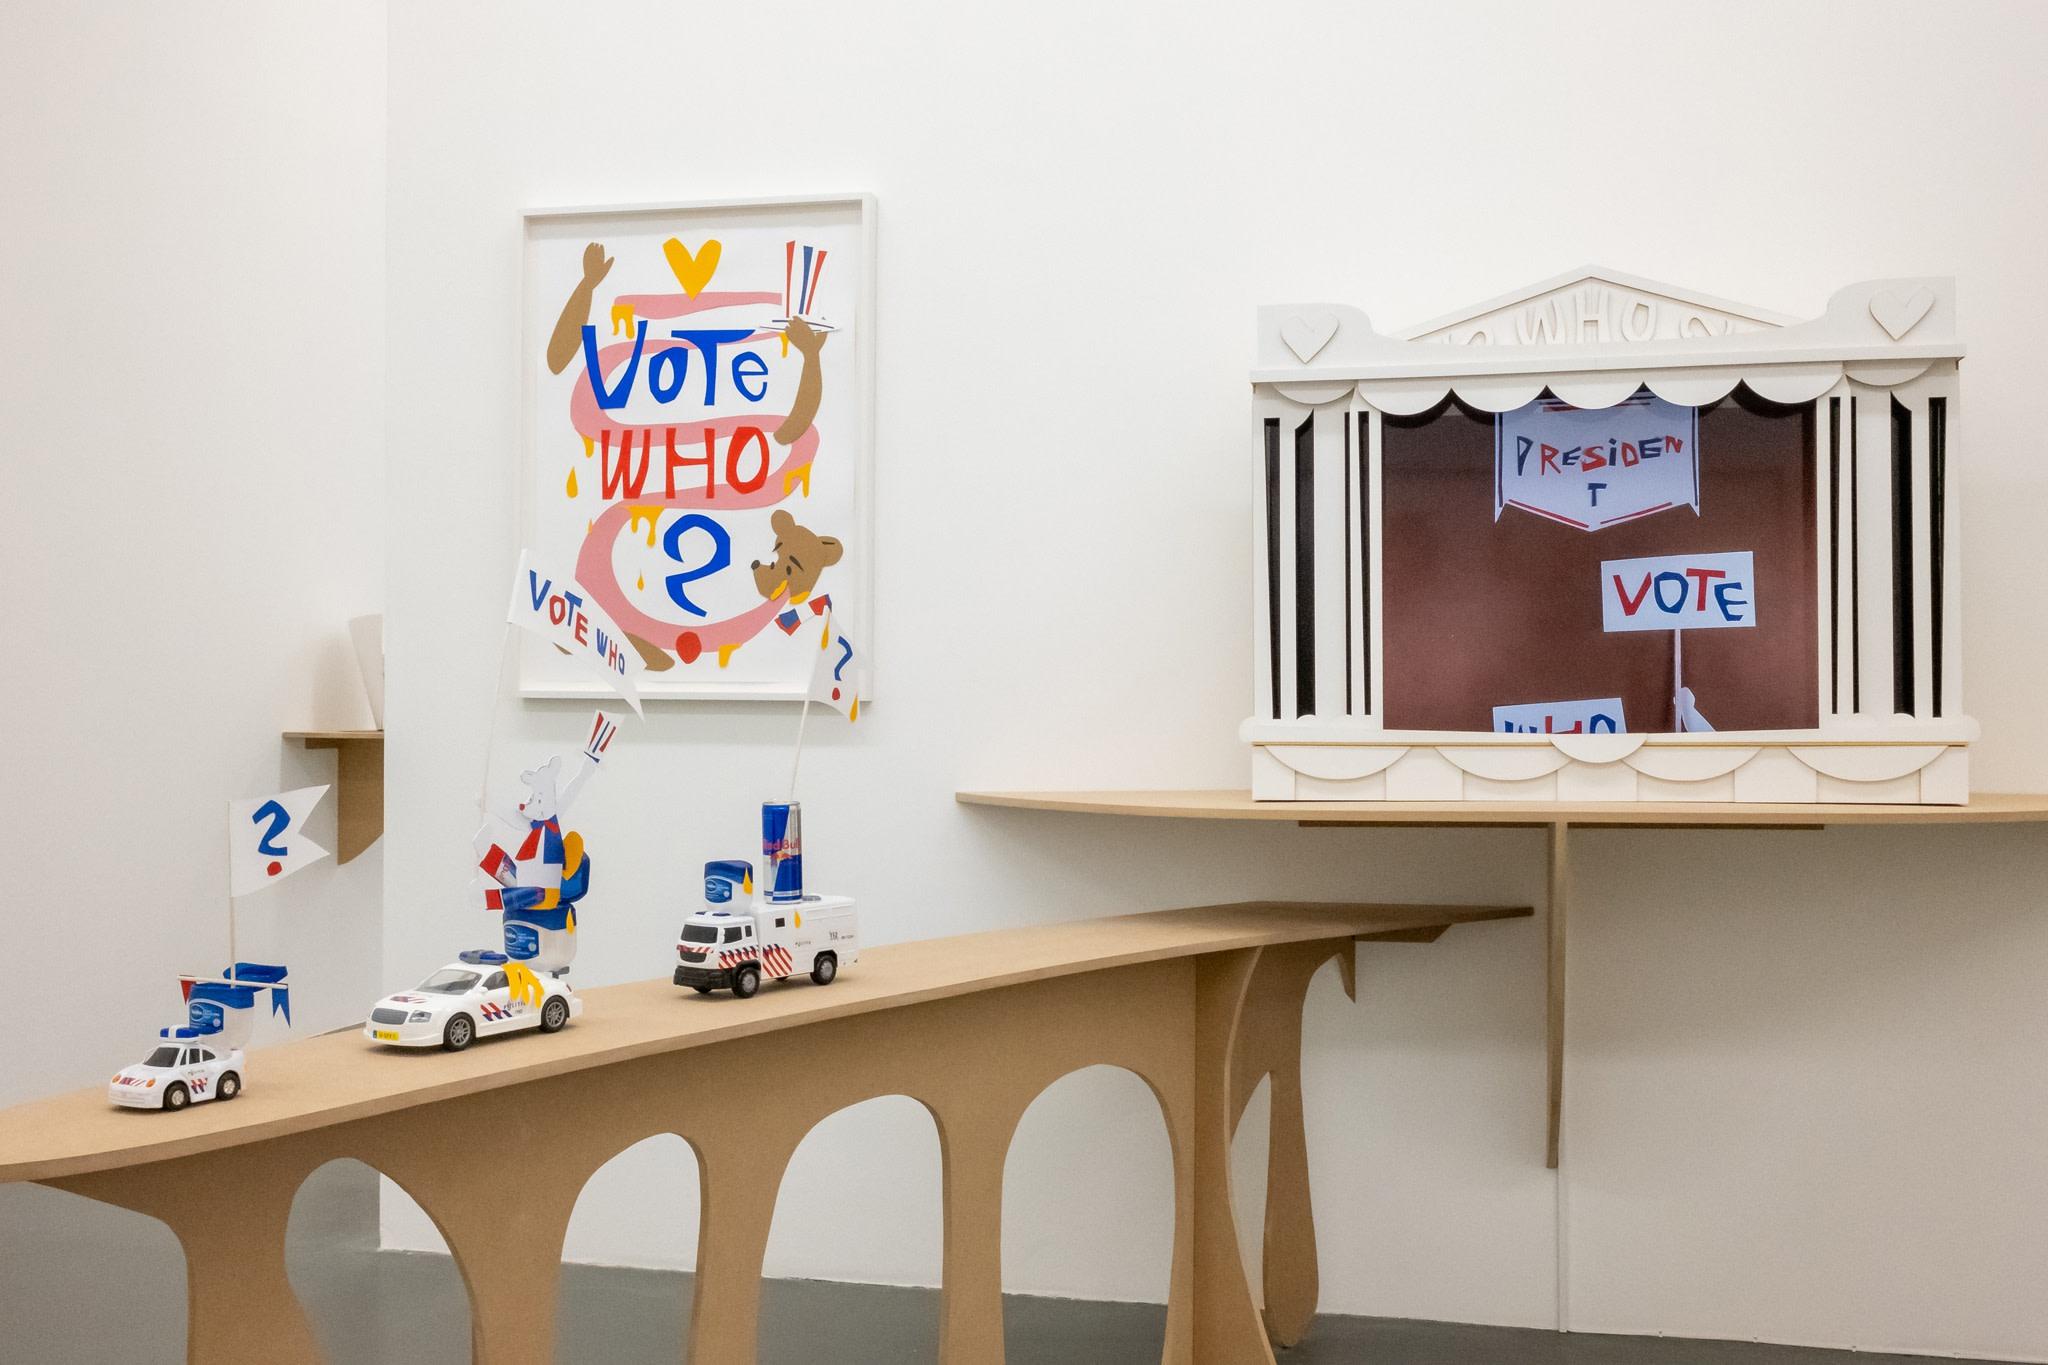 Exhibition view: Simon Fujiwara, new work, Melly Kunstintituut, Rotterdam, 2021. Photo © Jeroen Lavèn